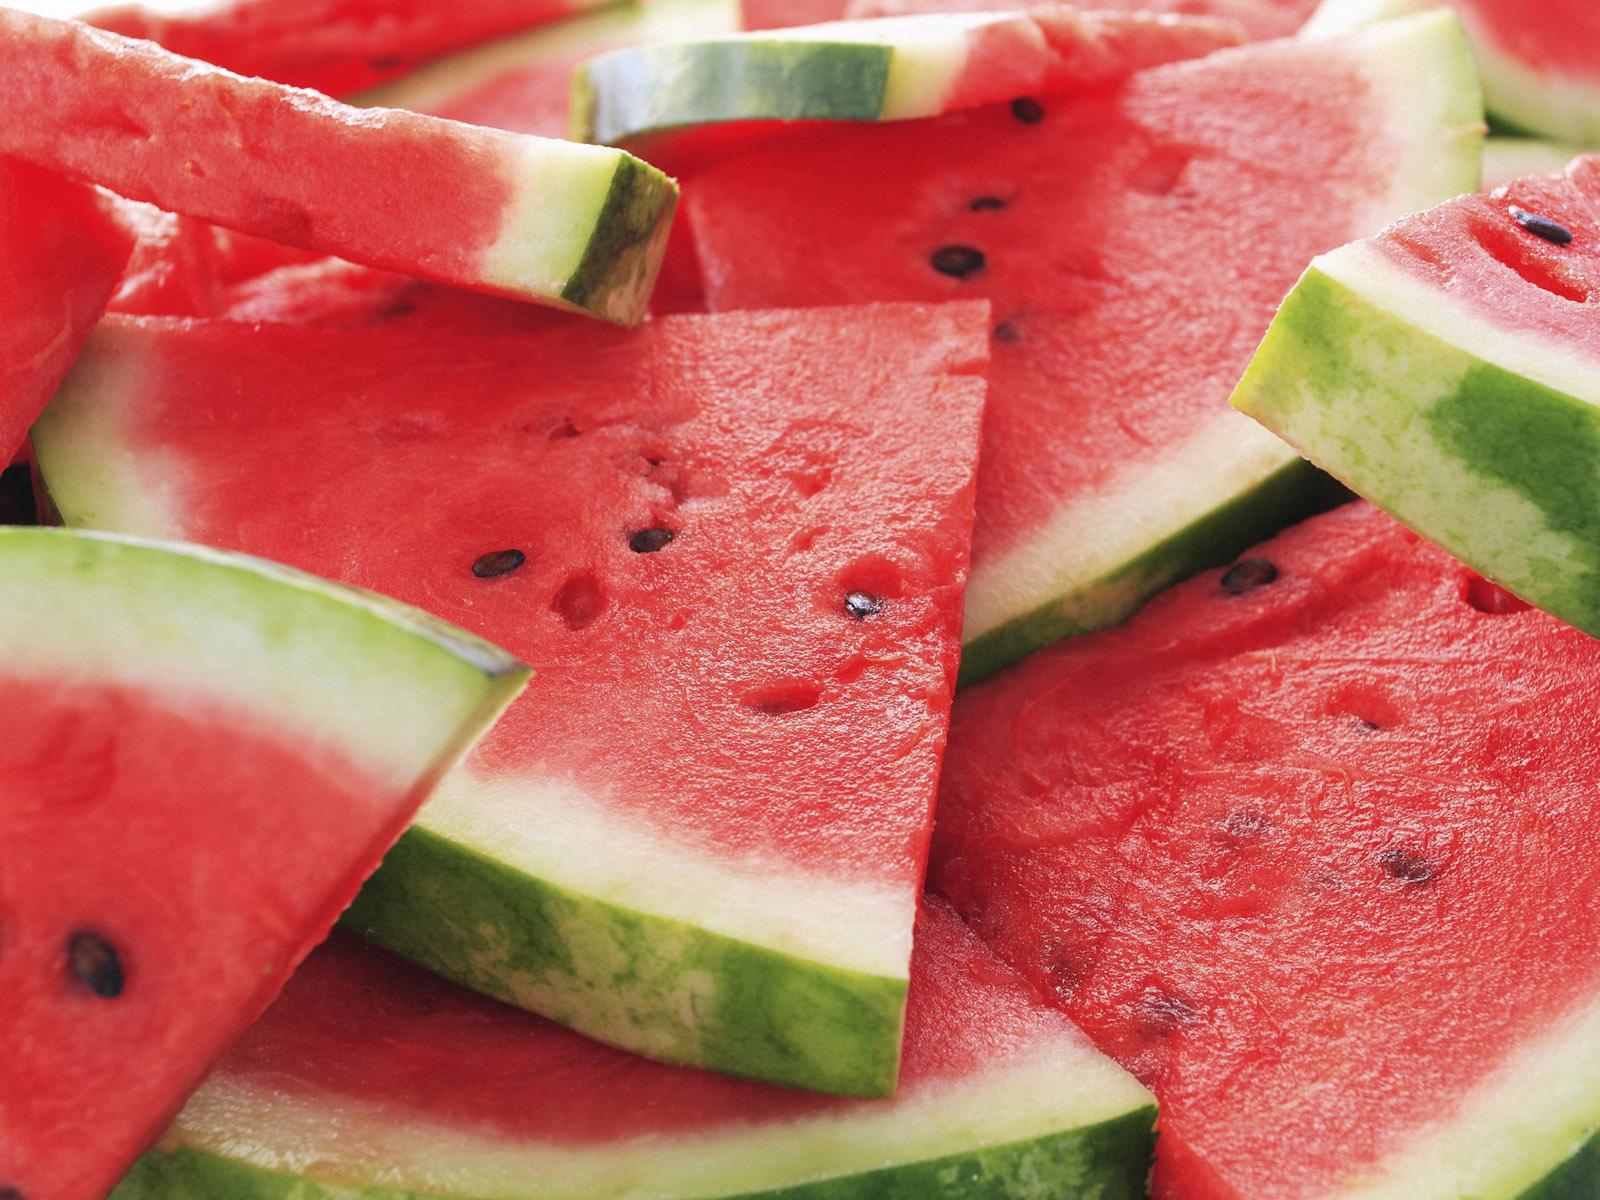 http://3.bp.blogspot.com/-P92xabv8-Hk/T3nnAeHGdvI/AAAAAAAABYA/ljg06K2VyHc/s1600/Juicy_watermelon_wallpaper.jpg